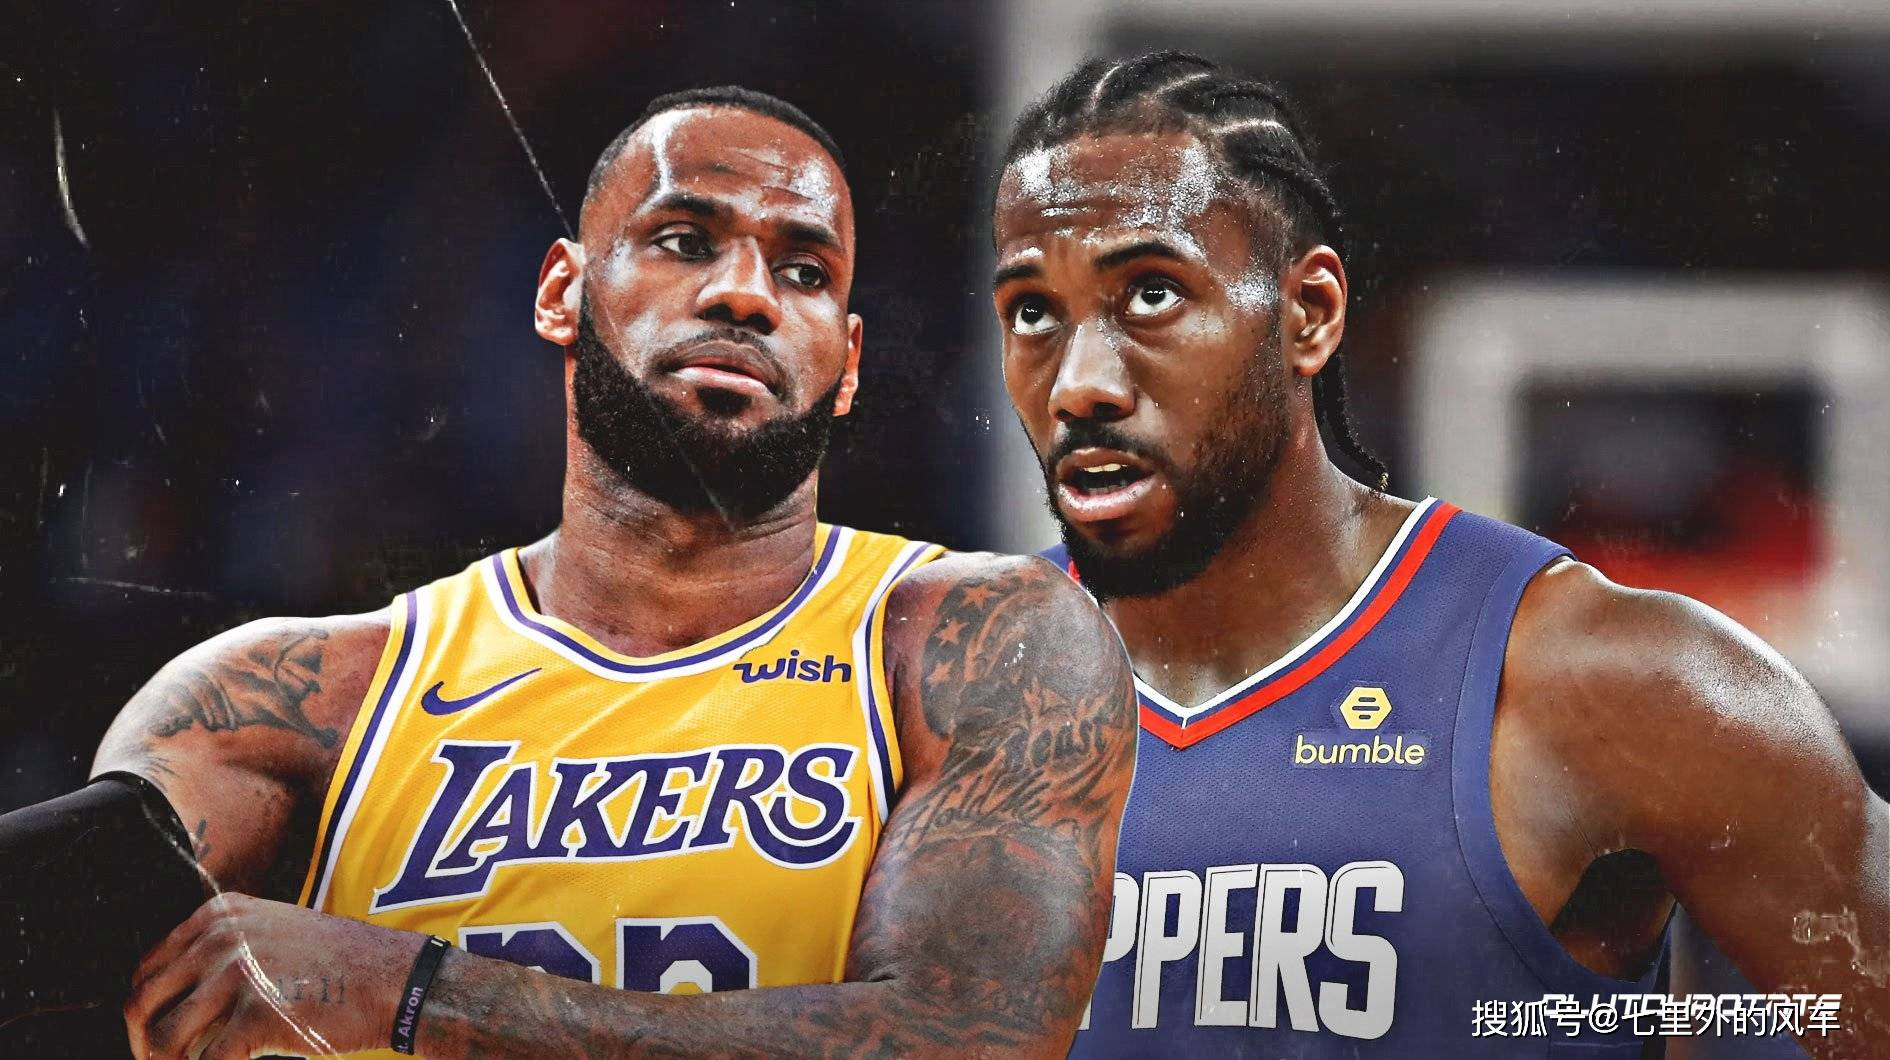 NBA季前赛【看赛事】直播:湖人vs快船 乔卡率队搅局斯台普斯